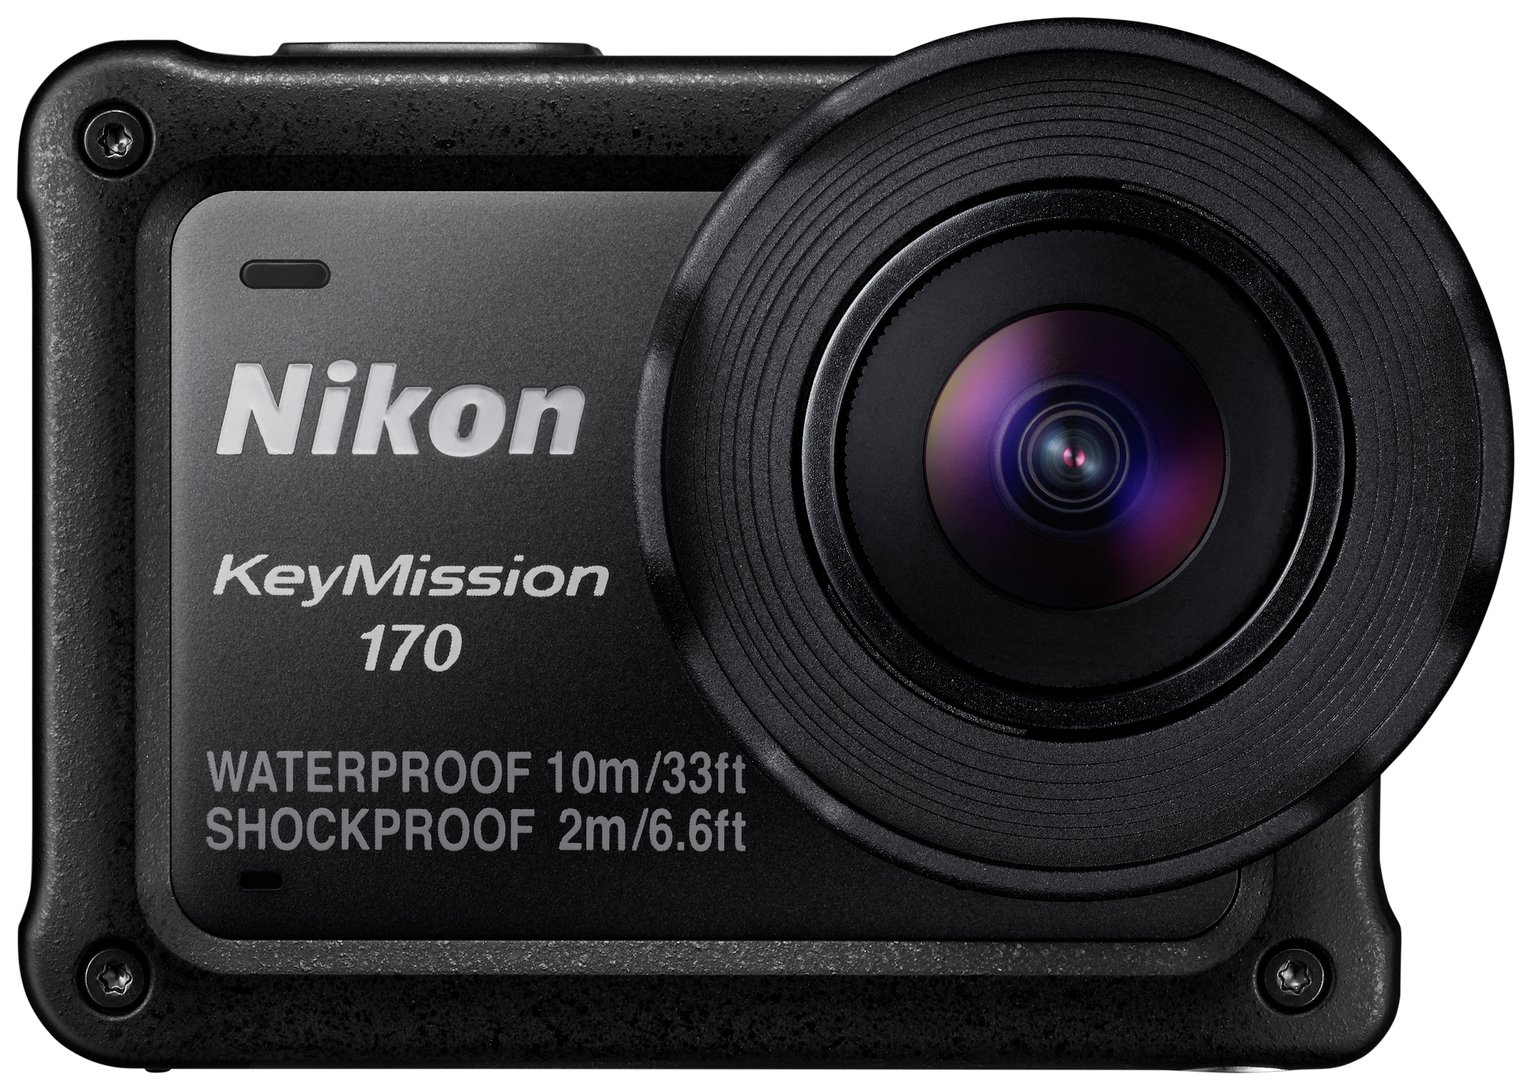 Nikon Keymission 170 Action Camera - Black